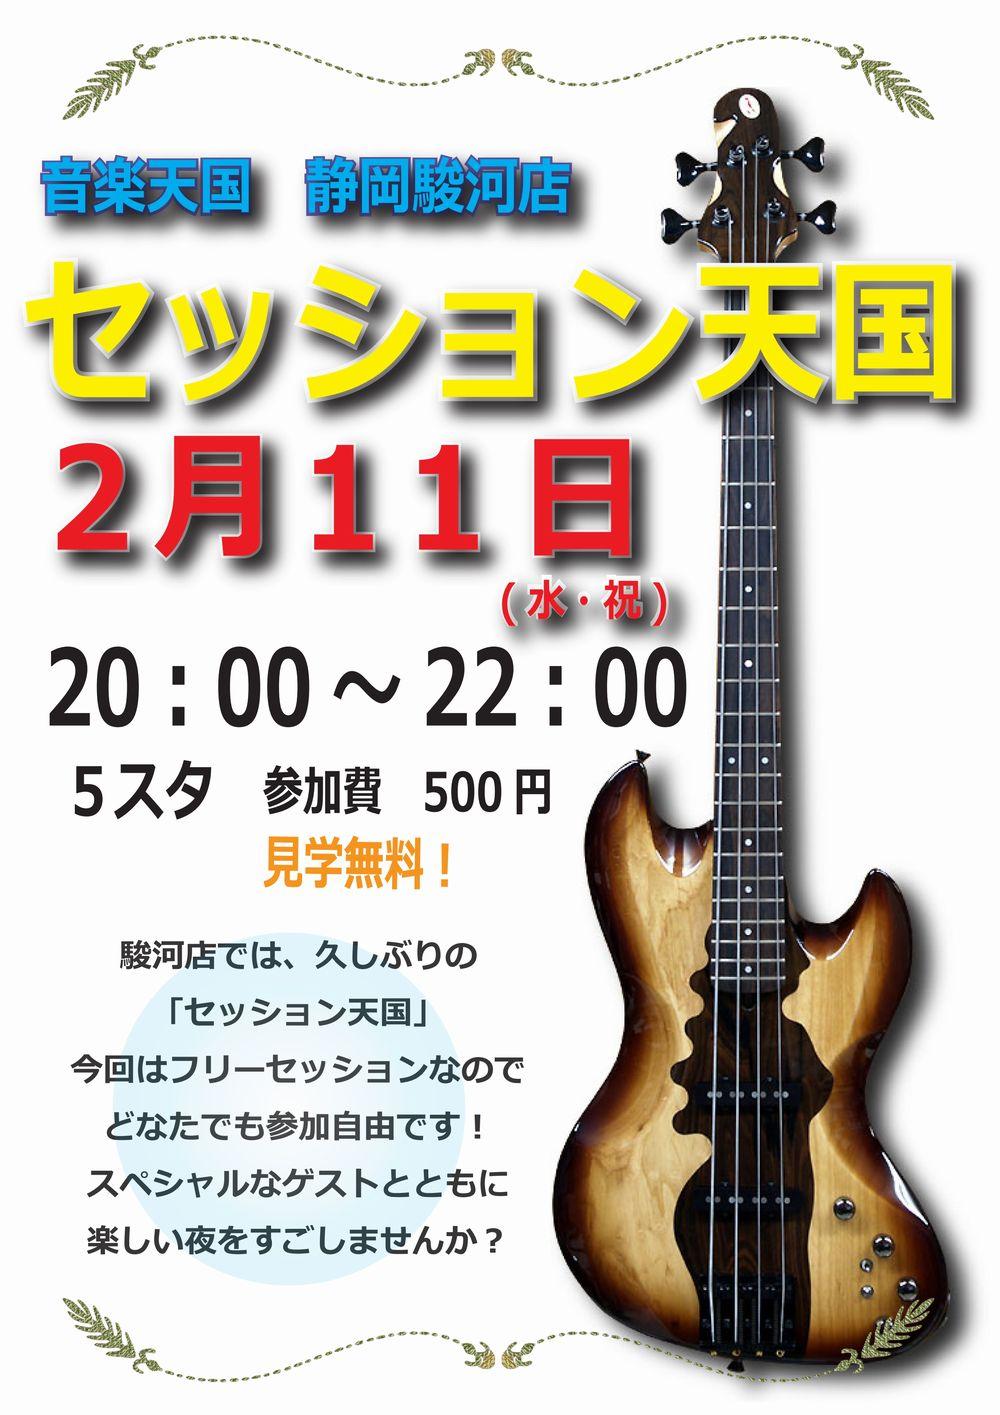 【セッション天国】@音楽天国・静岡駿河店2月11日(水・祝)開催